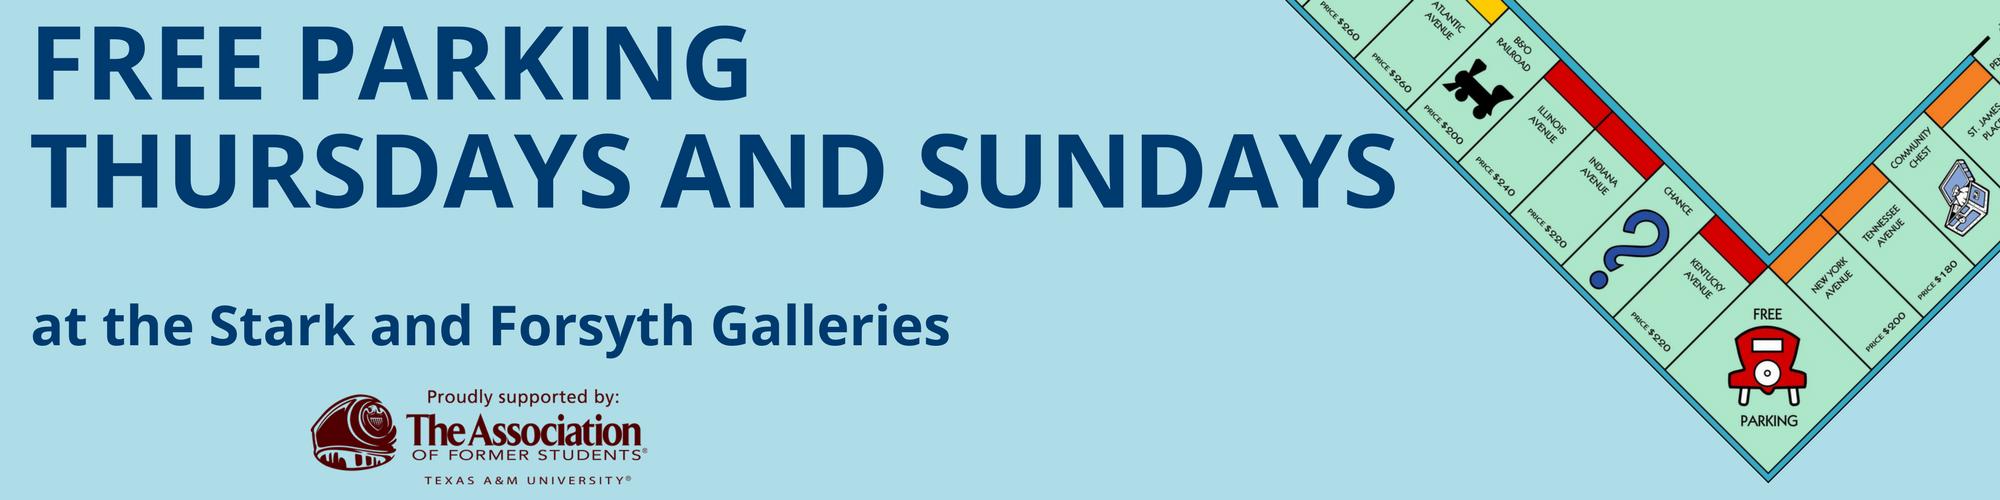 free parkingthursdays and sundays web banner